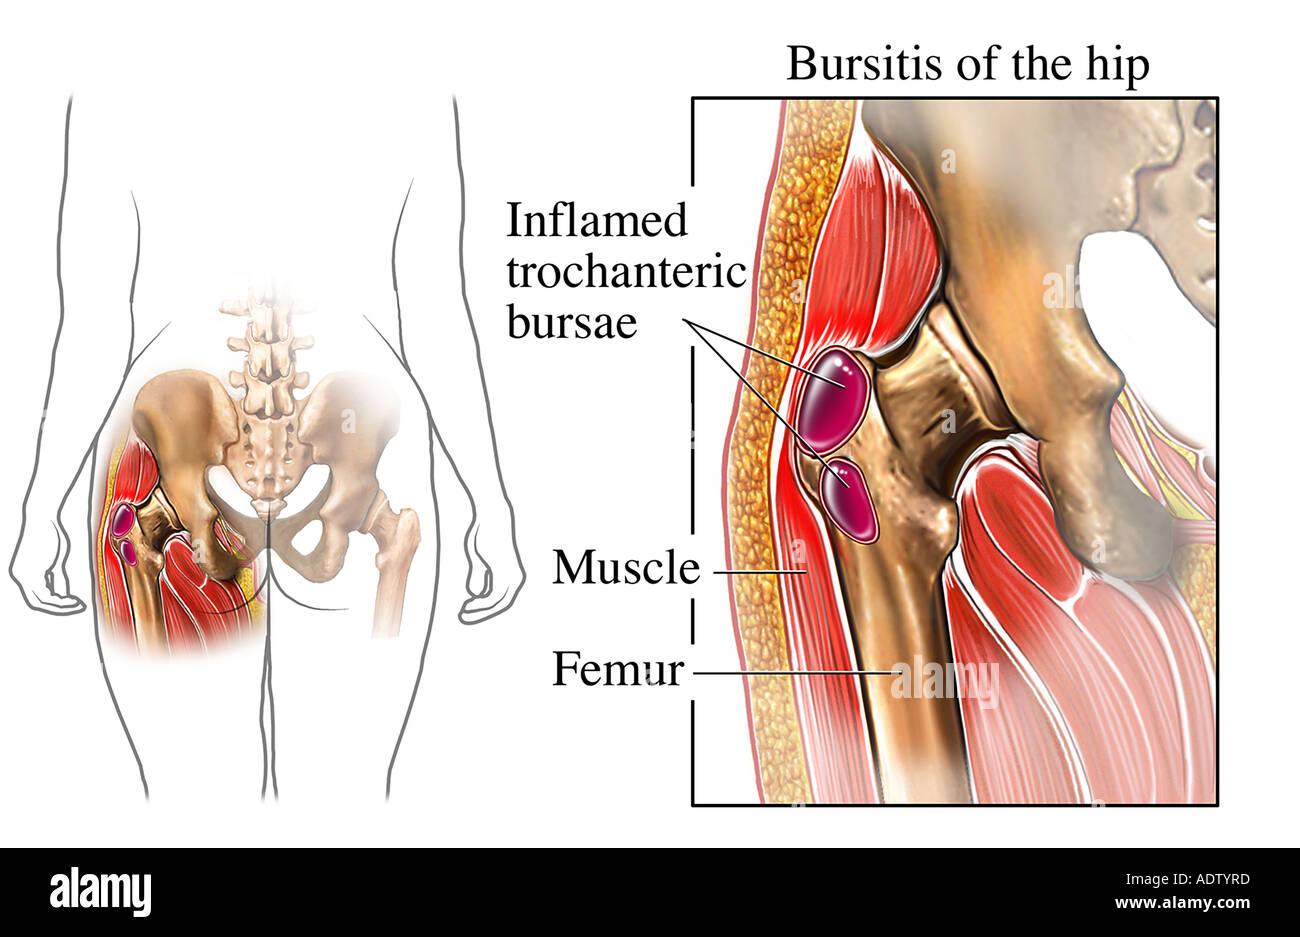 Bursitis of the Hip - Stock Image